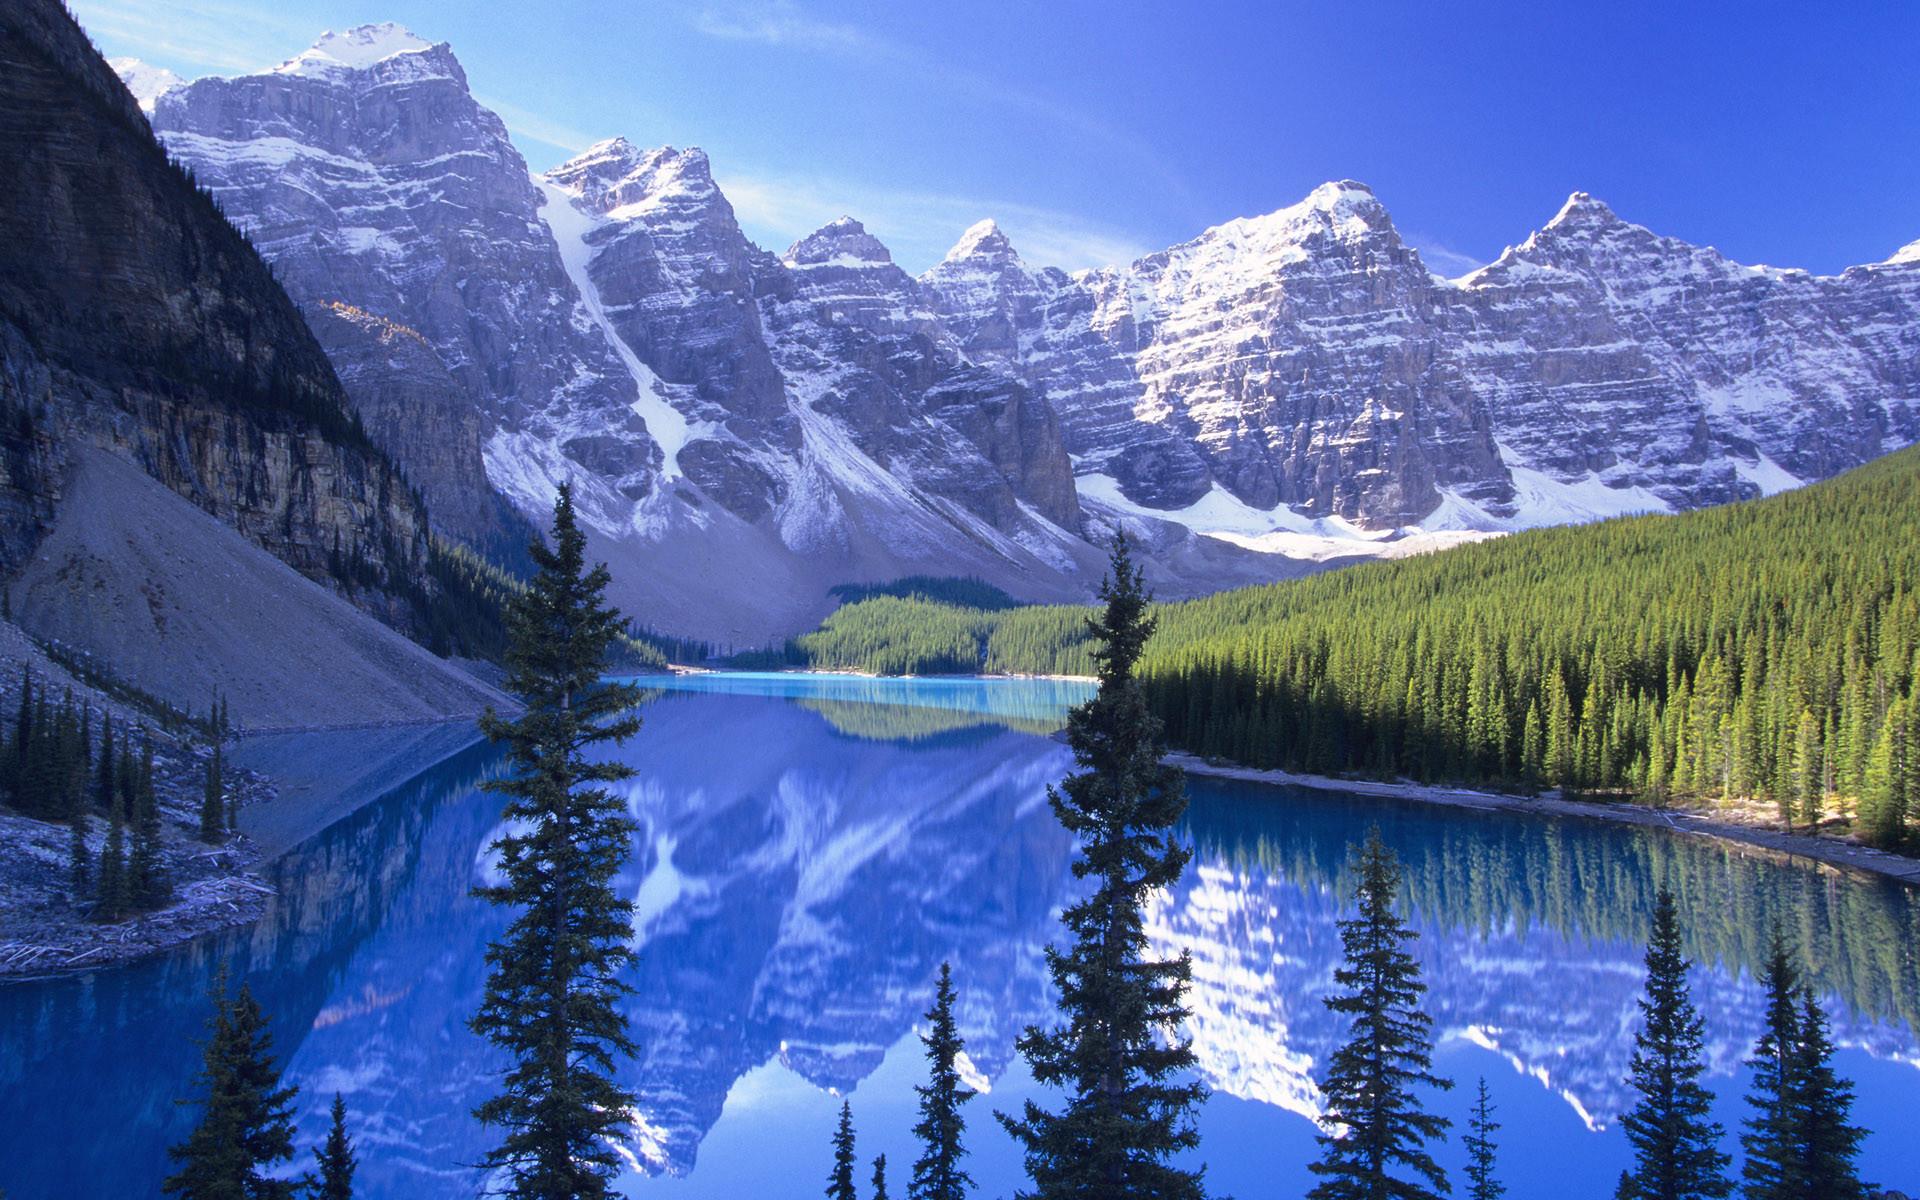 Free Microsoft Screensavers Winter Scene   … Blue, lakes, landscape,  mountains